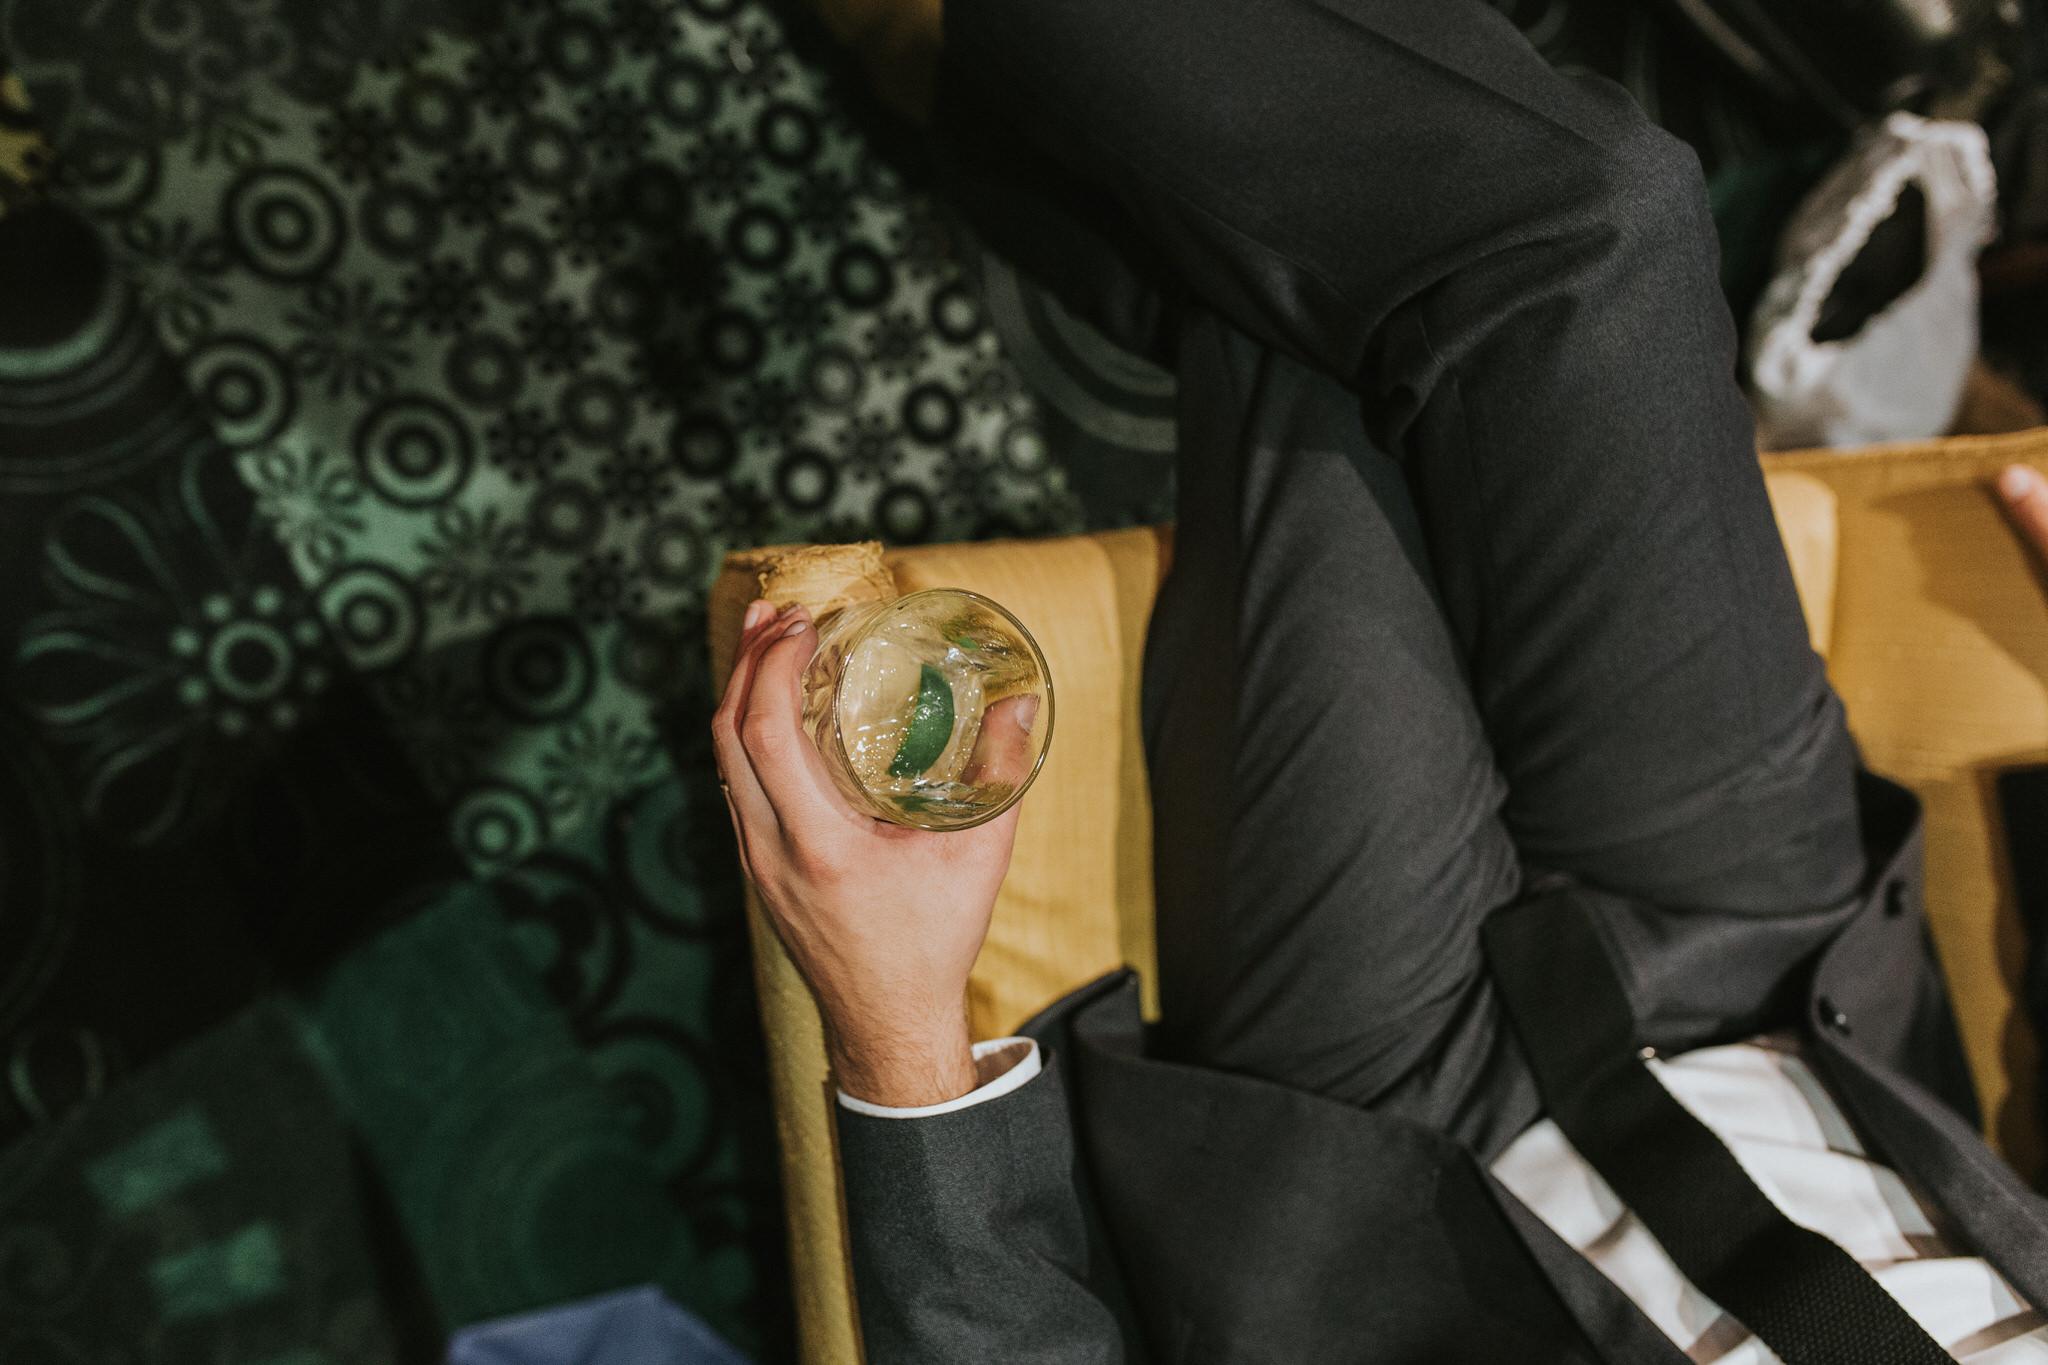 scarletoneillphotography_weddingphotography_prince edward county weddings012.JPG